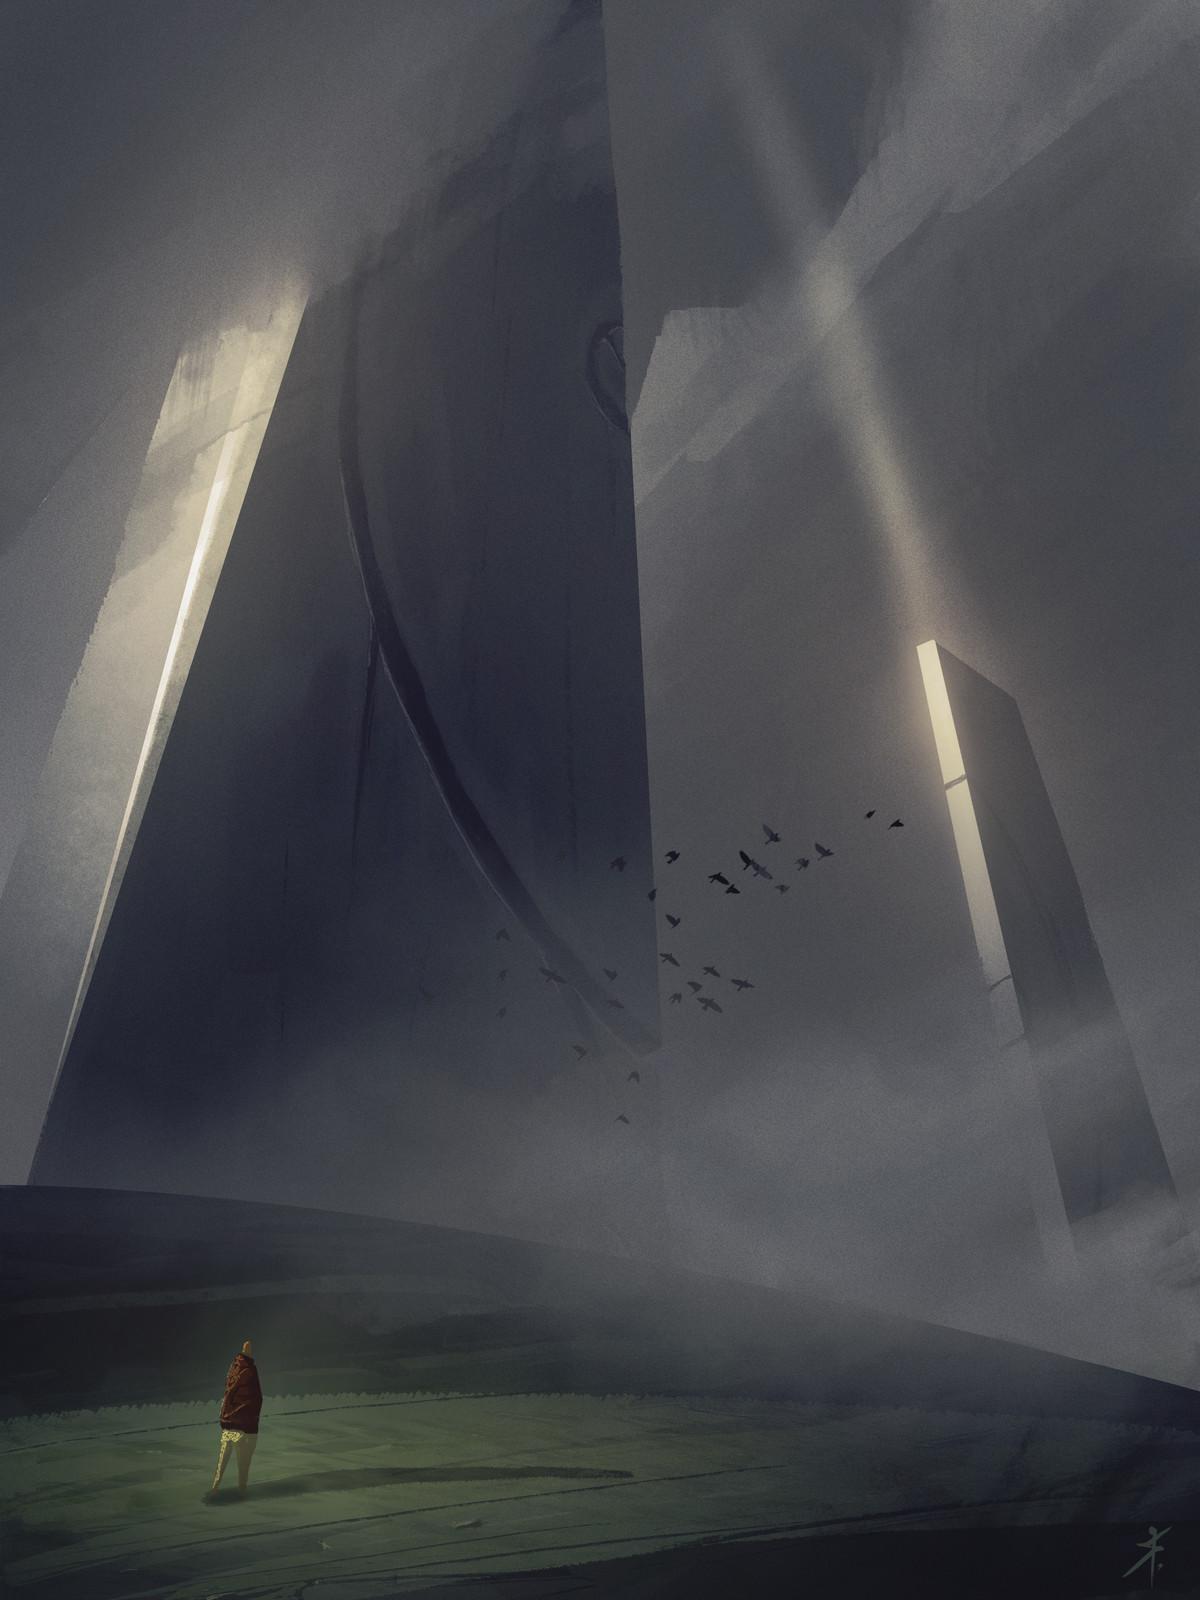 Pillars of Aeriel